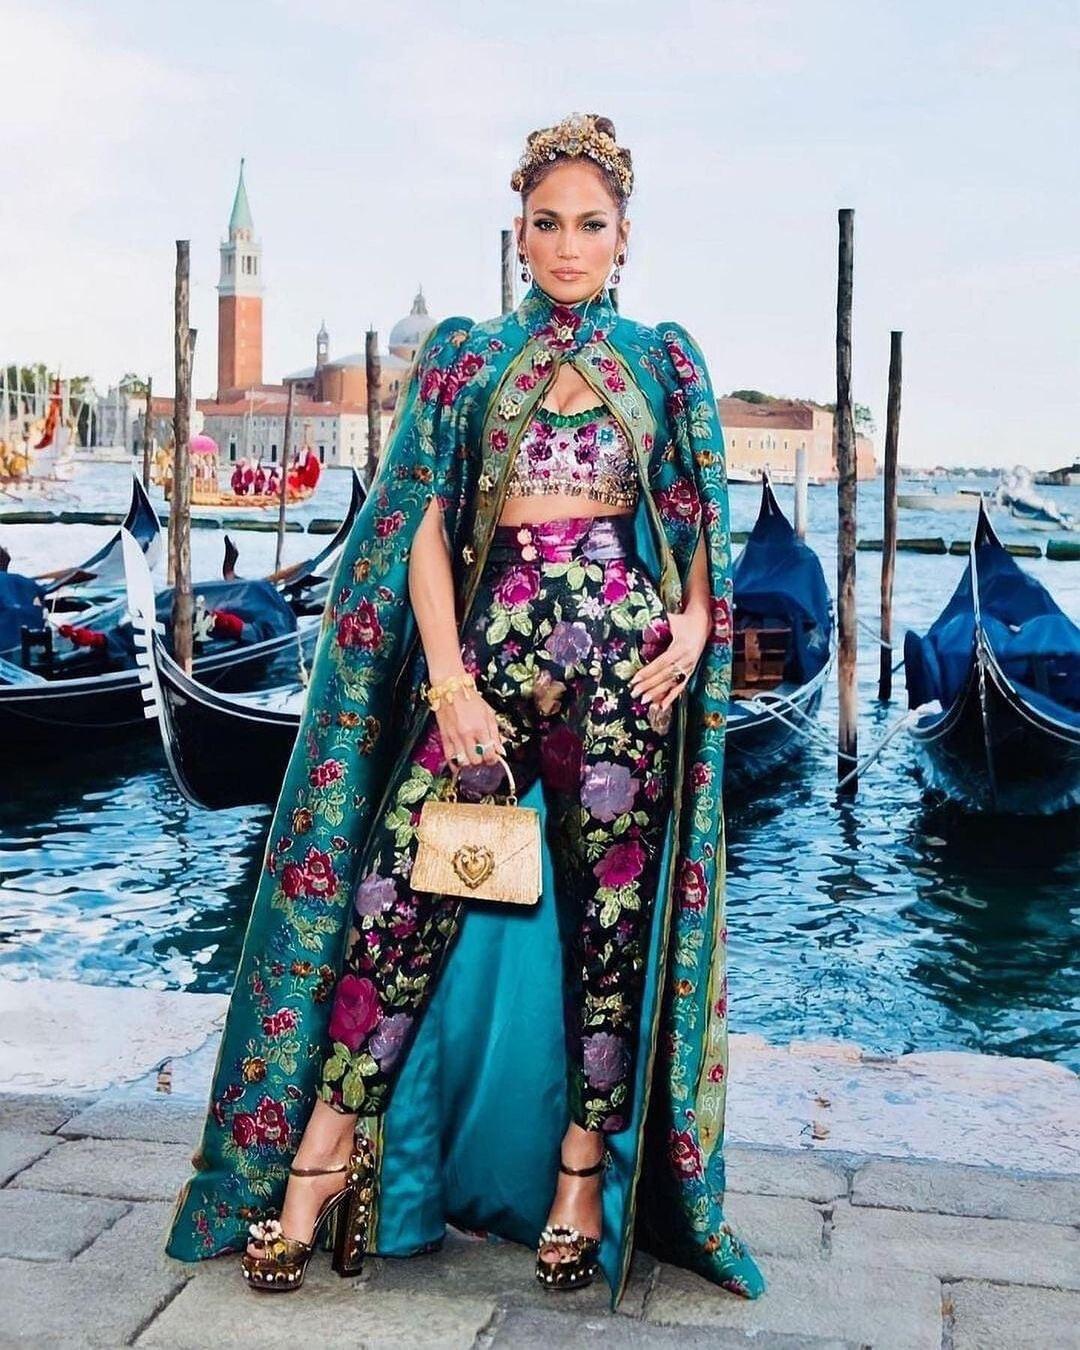 Jennifer Lopez Dolce & Gabbana Venezia